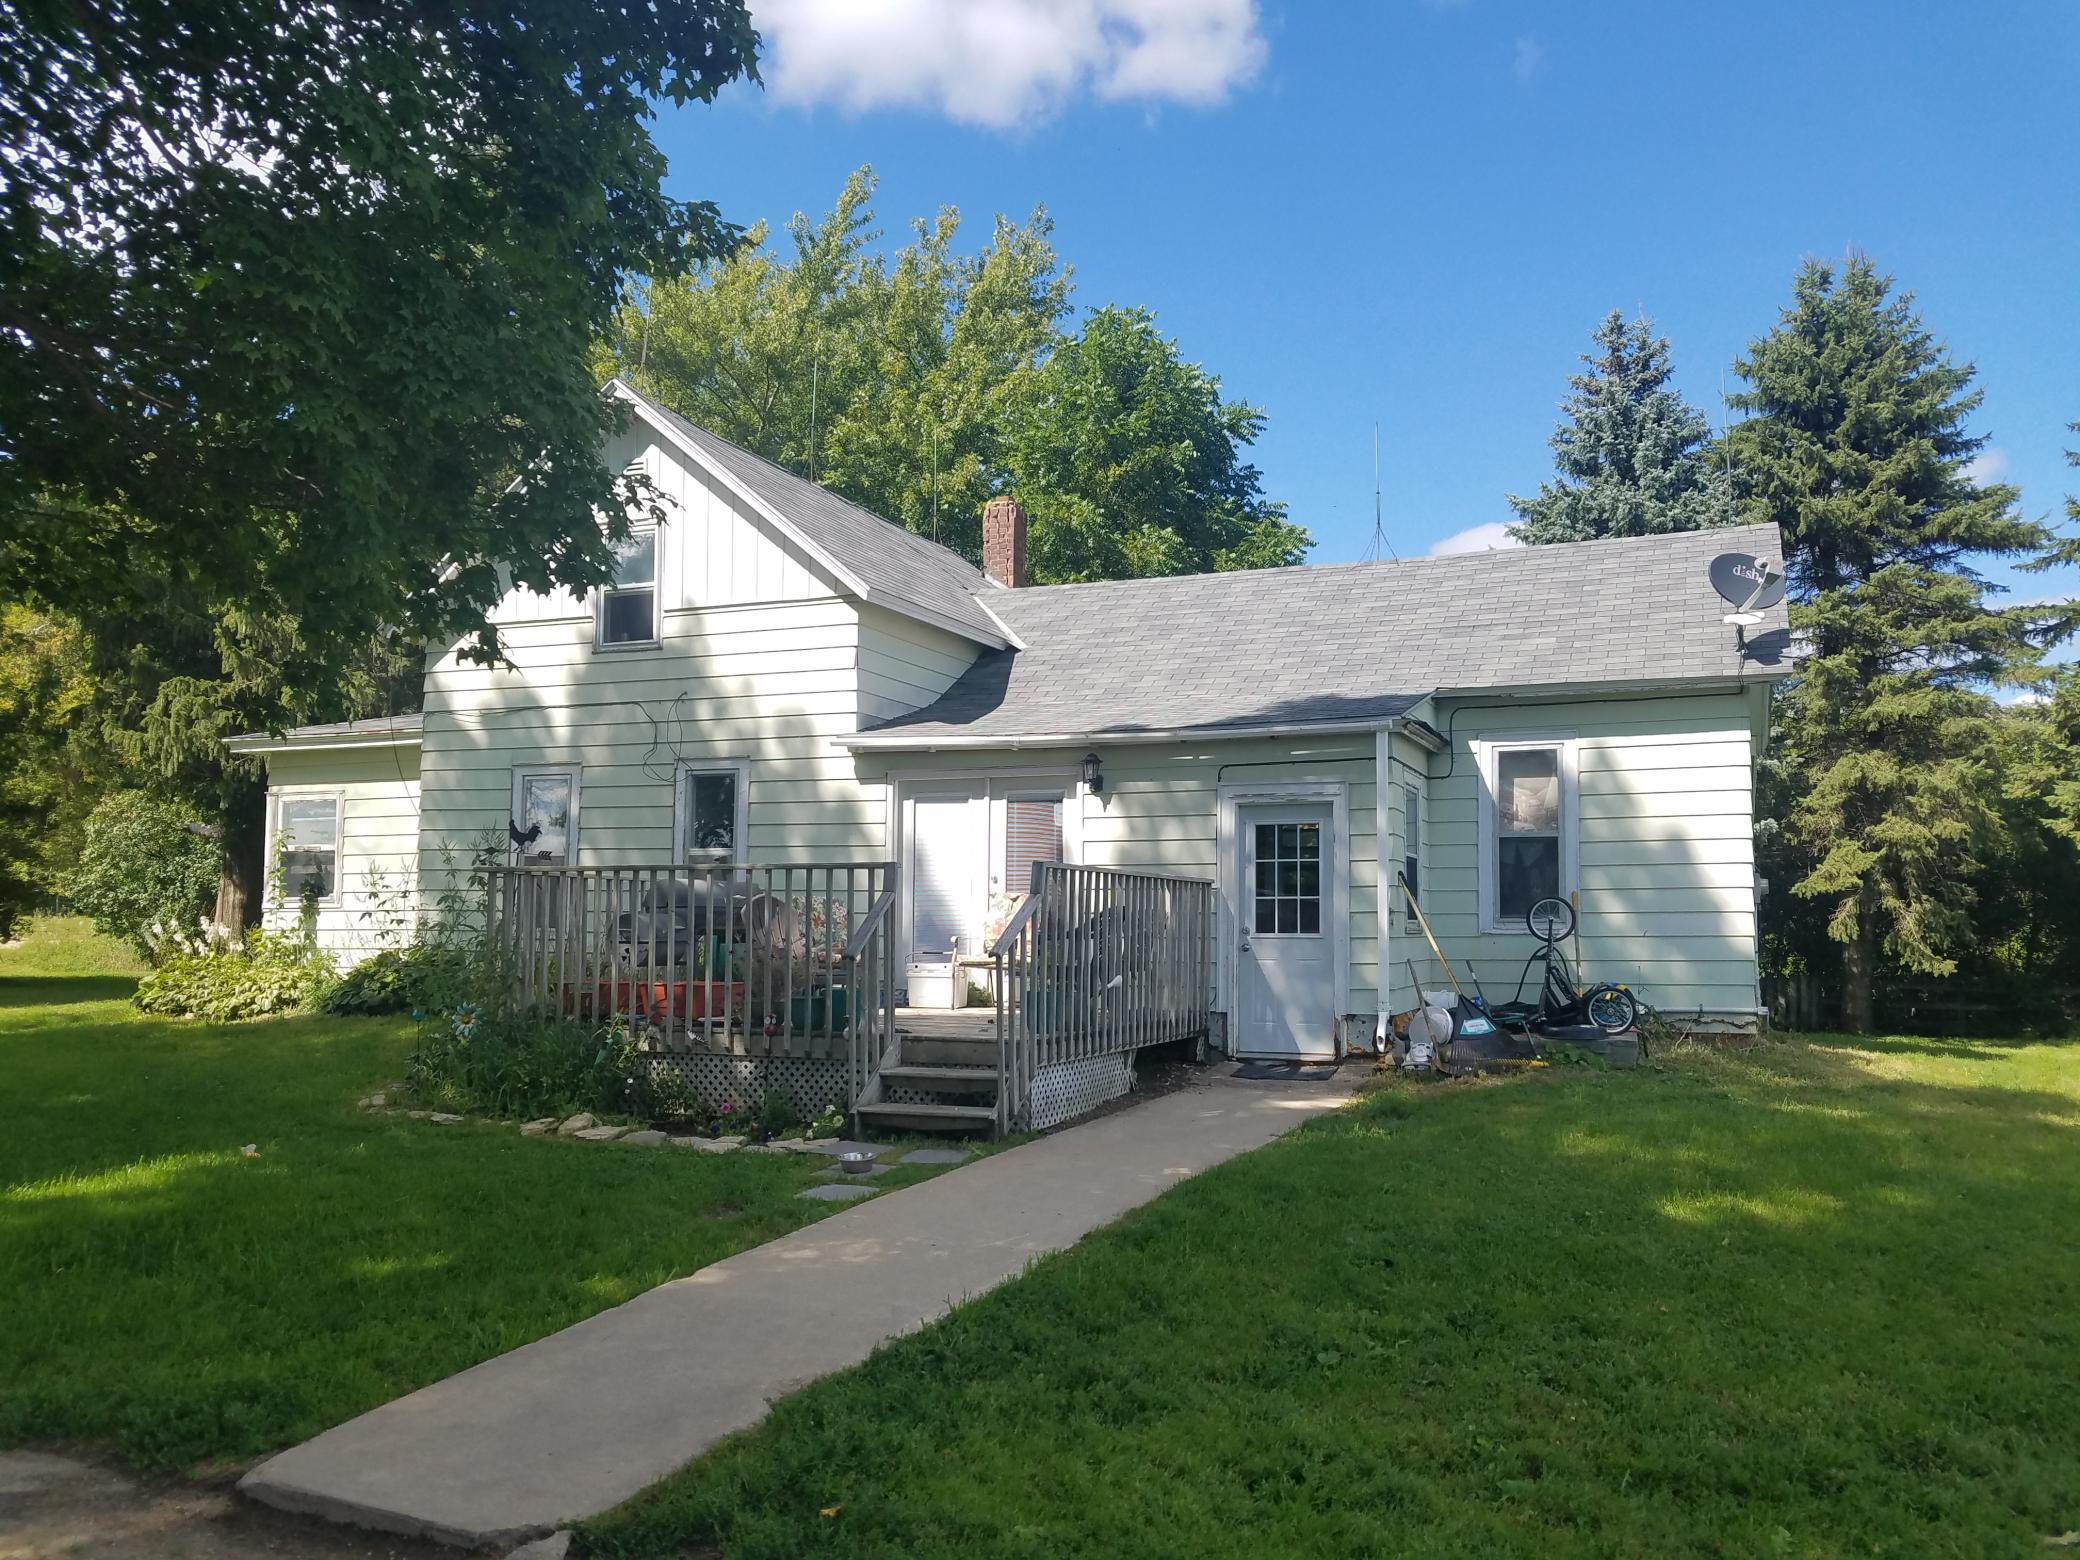 56844 205th Avenue Property Photo - Dodge Center, MN real estate listing